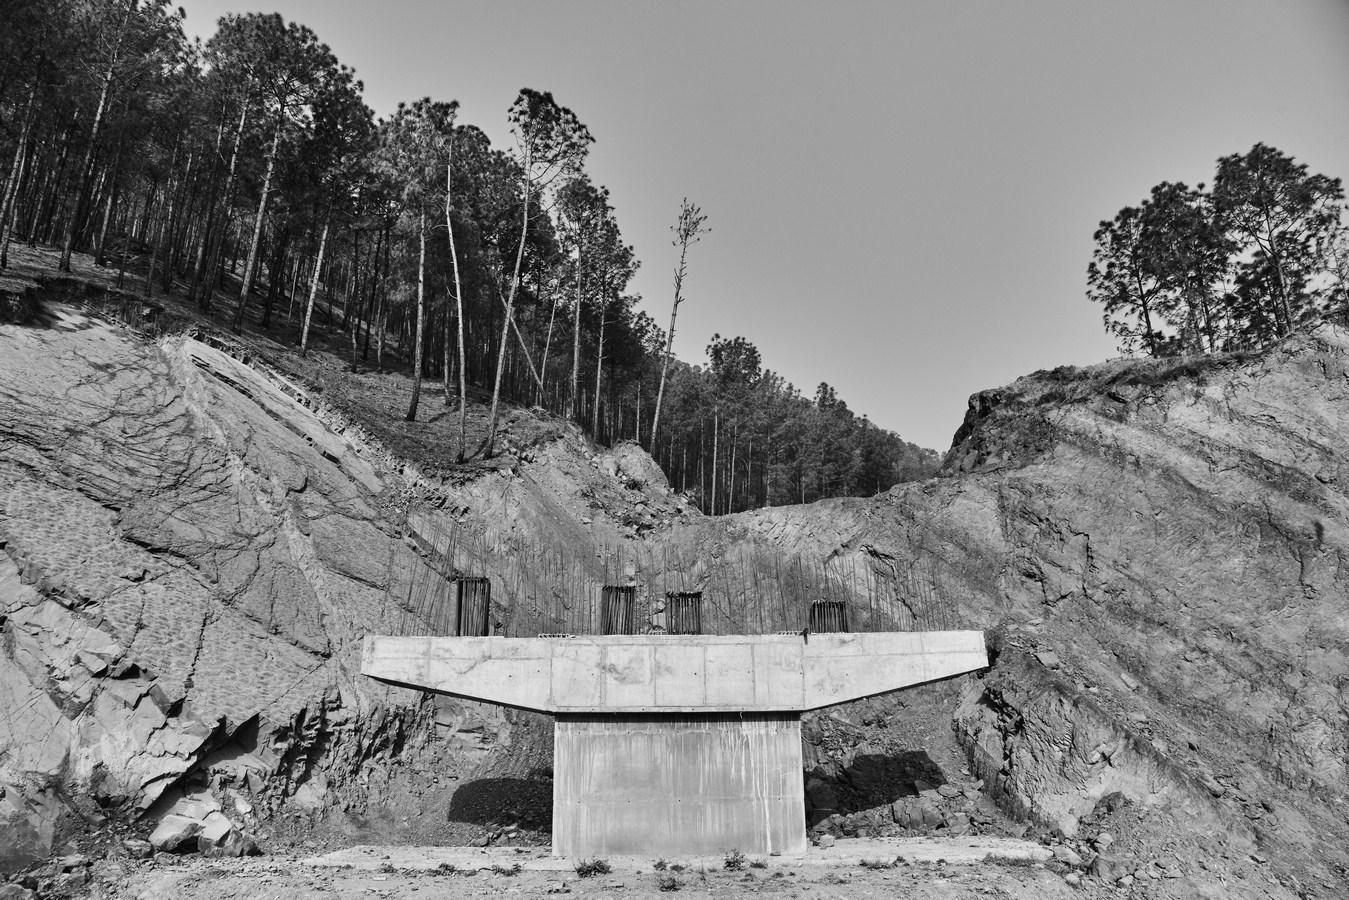 "Samleach (Kalka To Shimla Road), Himachal Pradesh, India | Photograph | 12"" x 18"" | 2017"